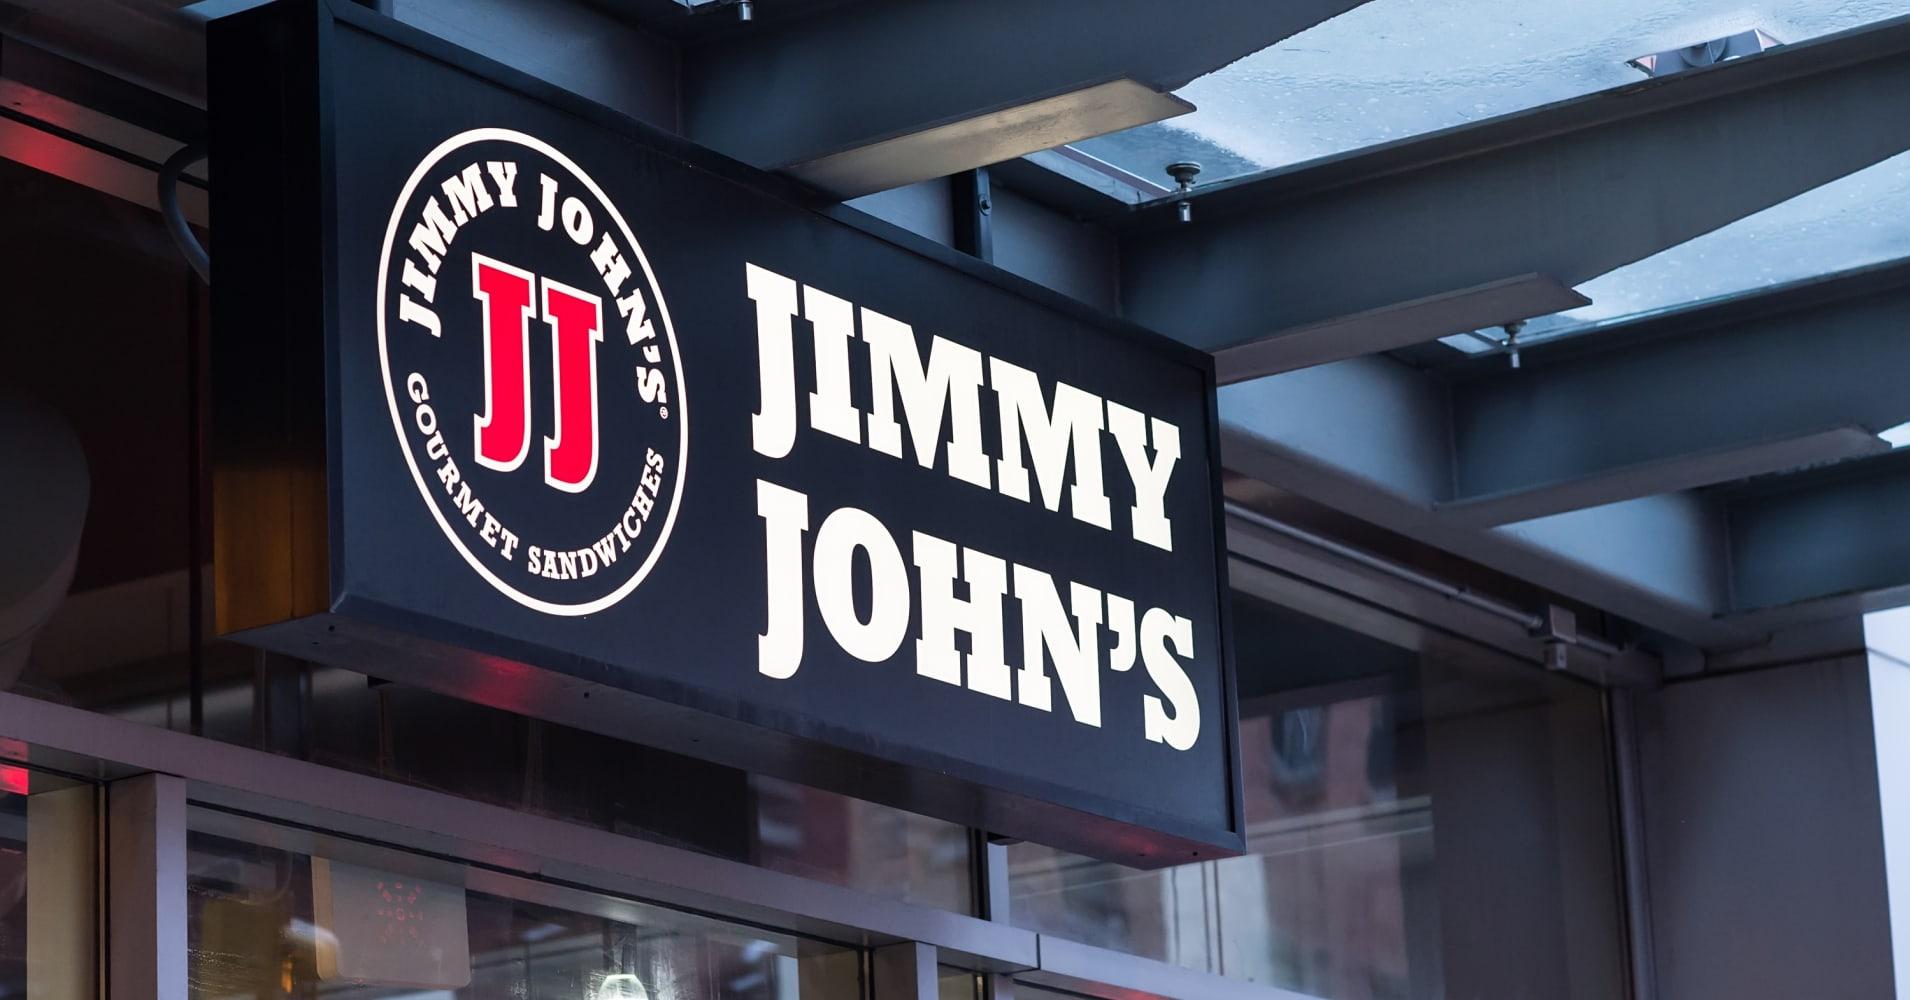 Sandwich chain Jimmy John's prepares IPO: Sources